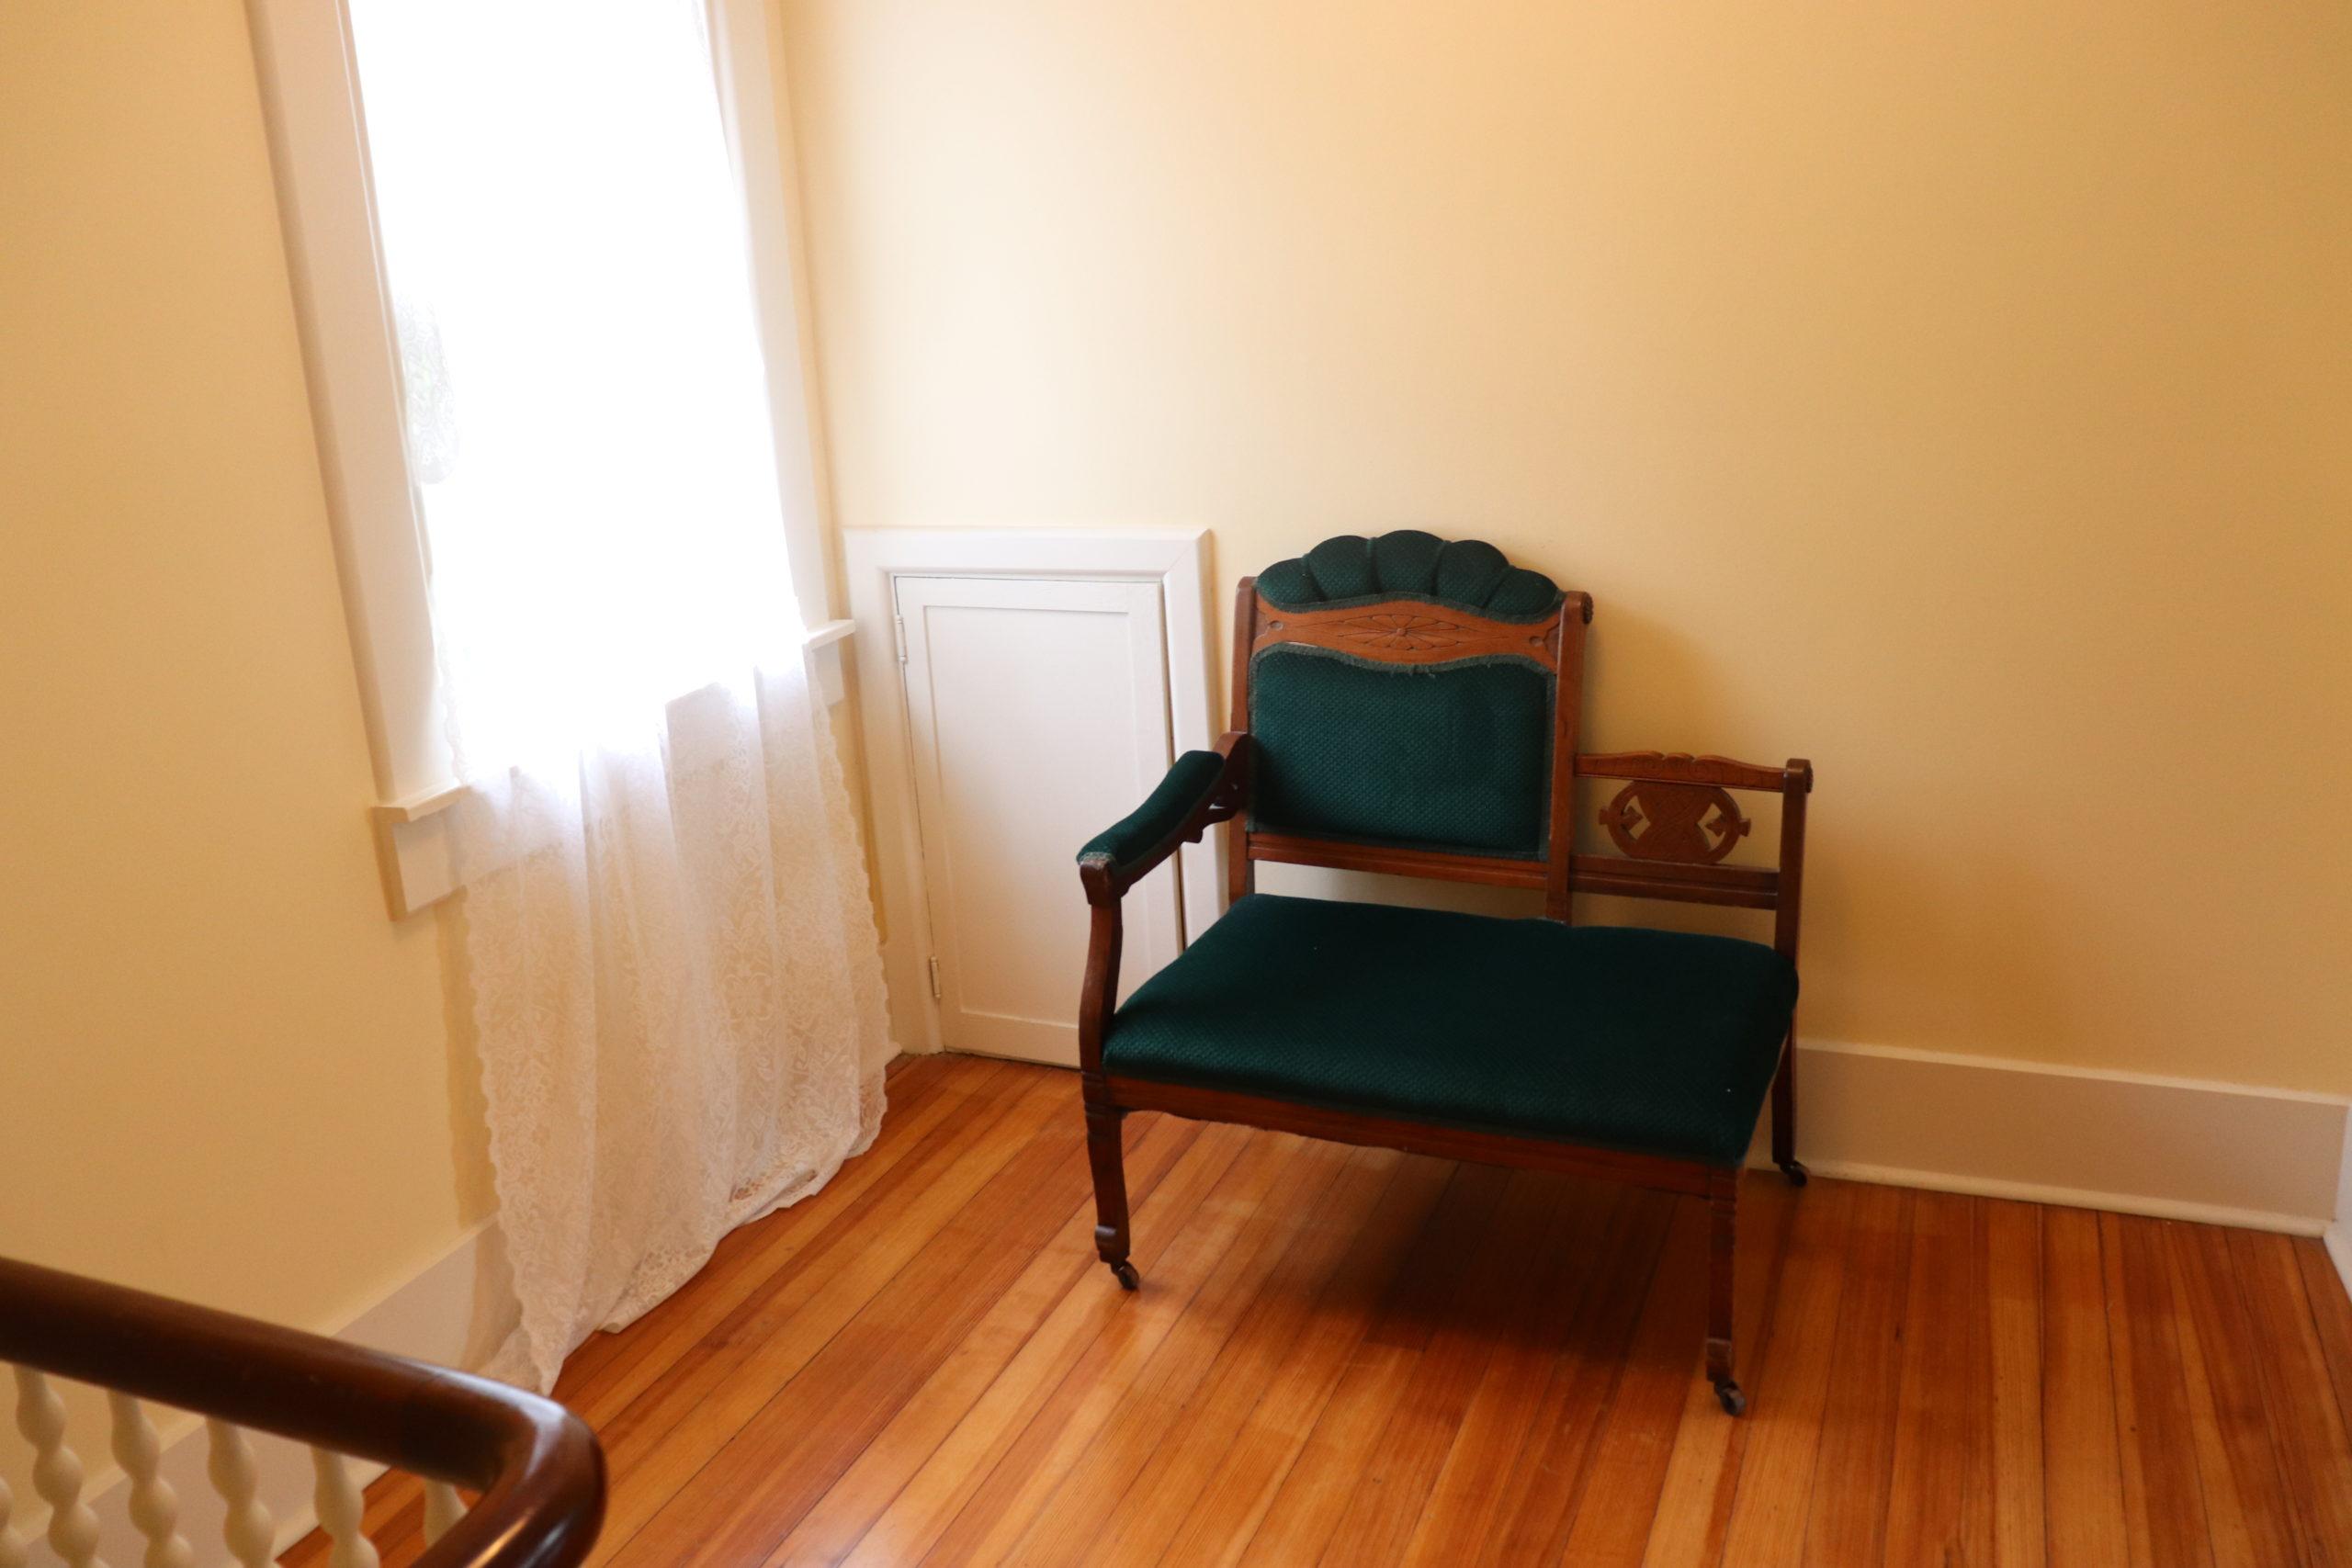 a chair in a hallway